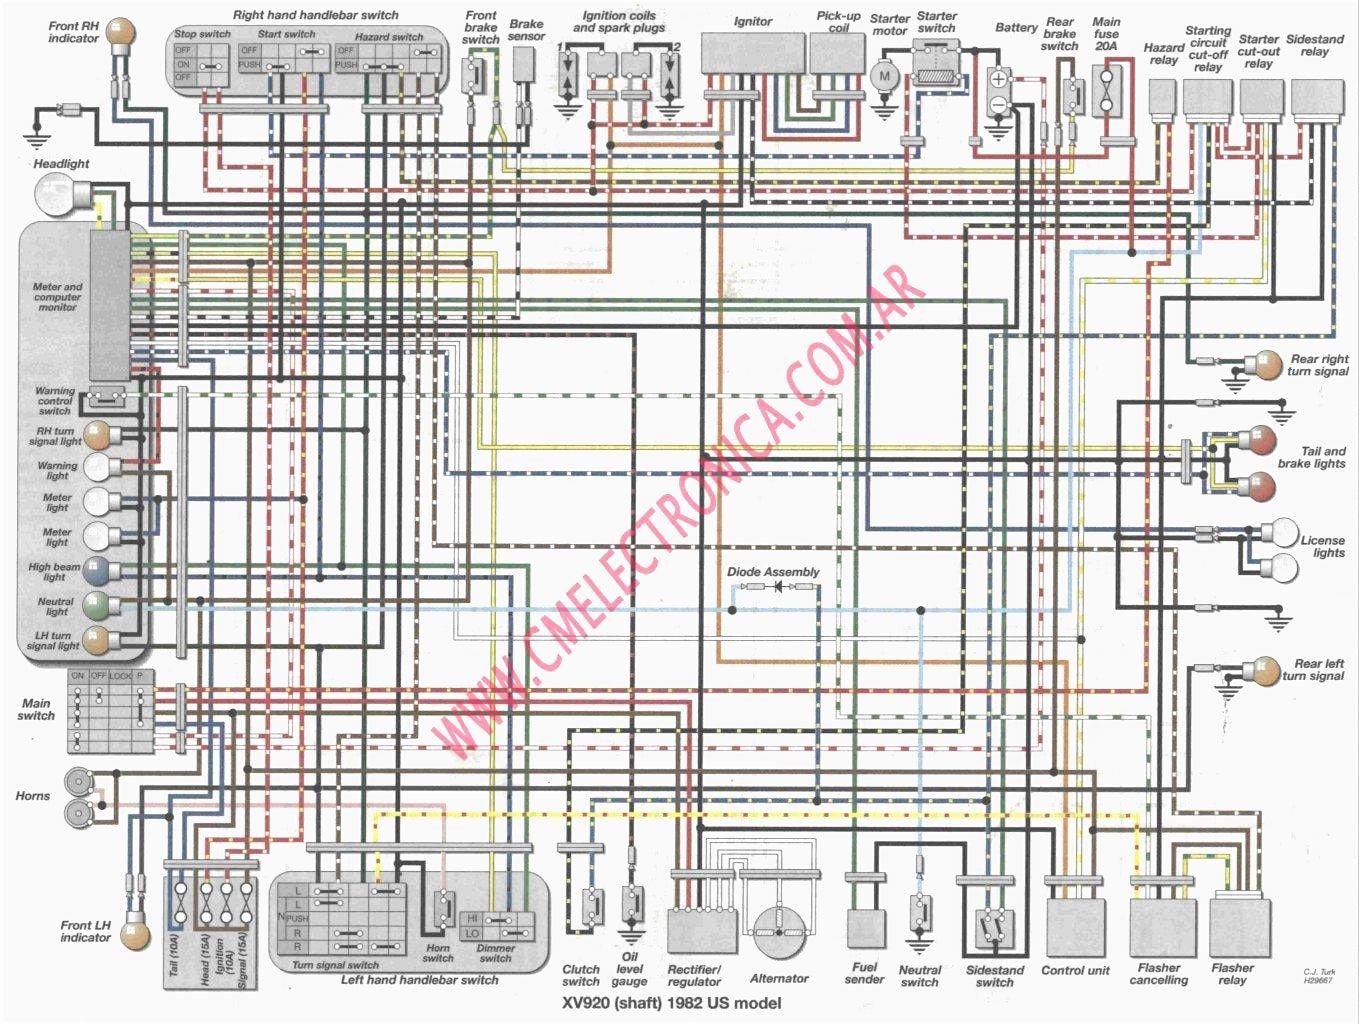 [TVPR_3874]  AZ_7932] Yamaha 1100 Wiring Diagram Free Diagram   Virago 1100 Wiring Schematic      Expe Lave Itis Mohammedshrine Librar Wiring 101